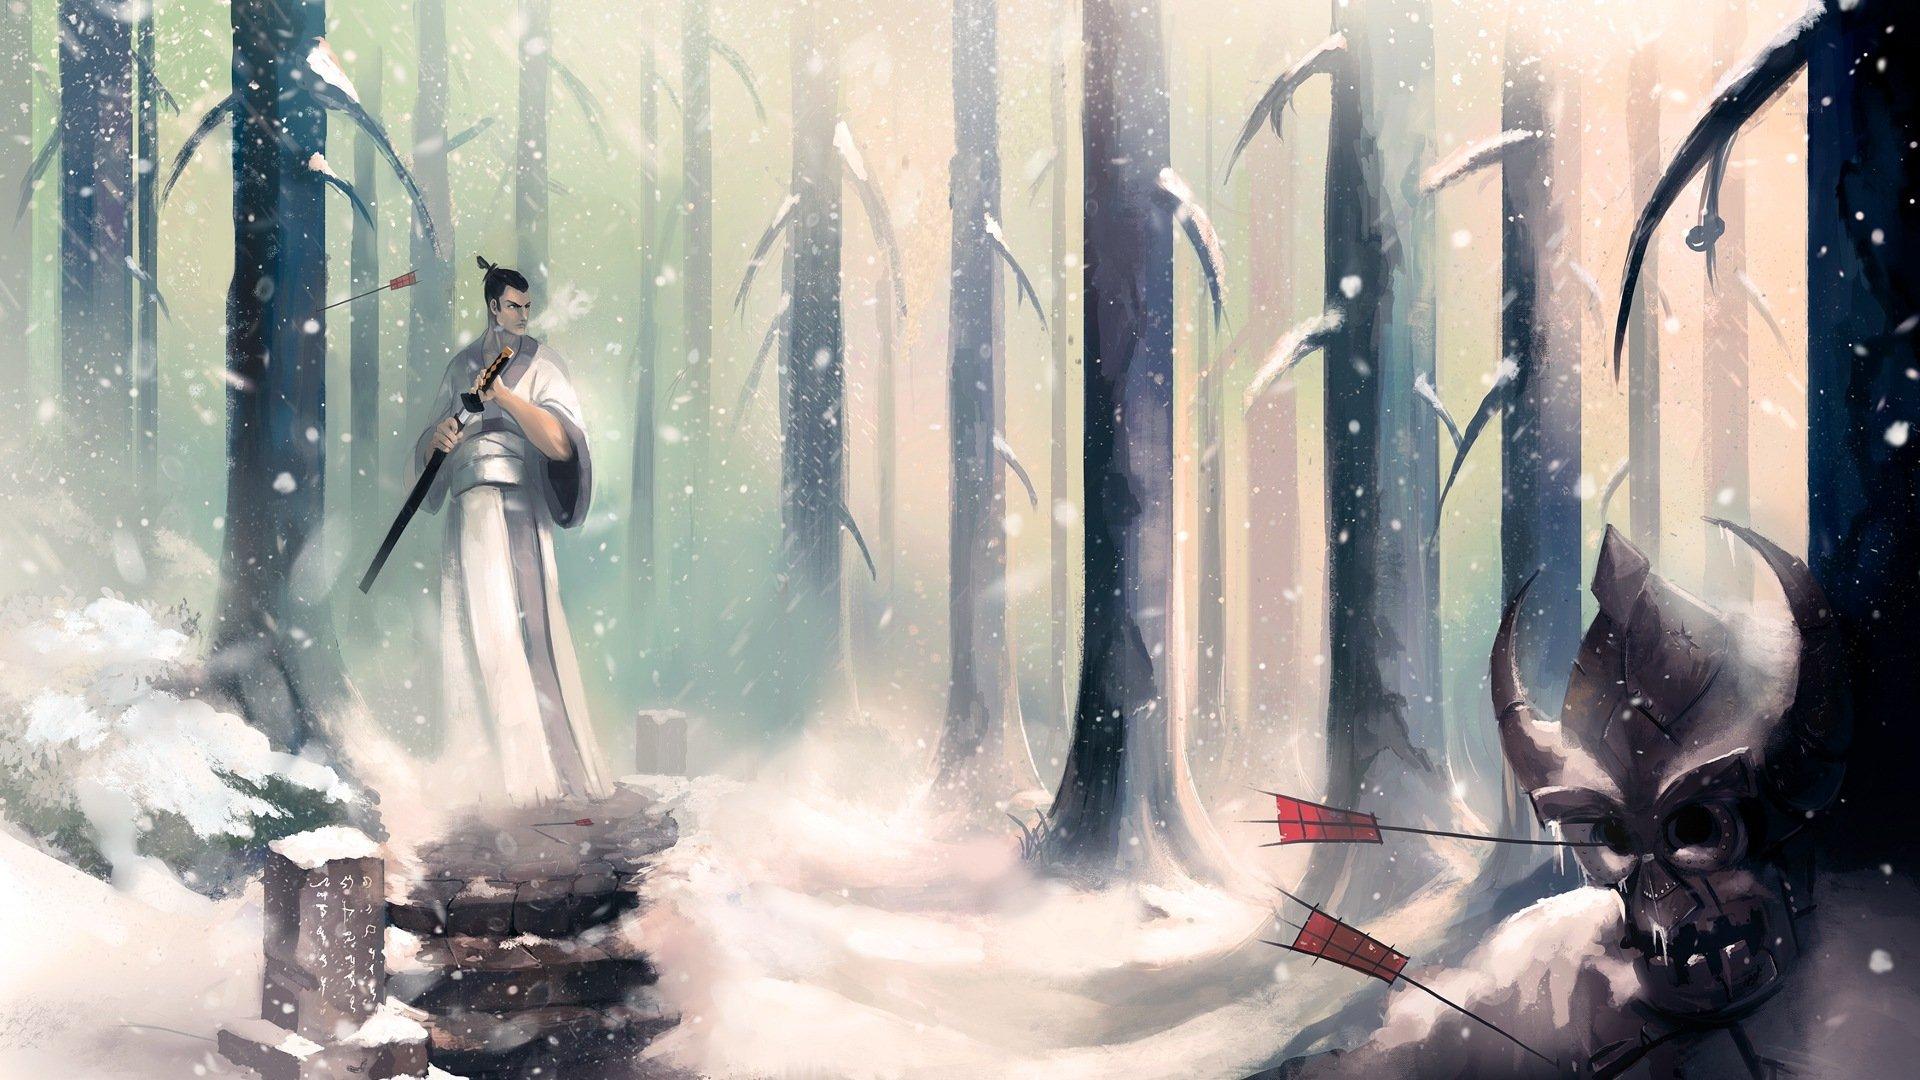 samurai jack hd wallpaper | hintergrund | 1920x1080 | id:812967